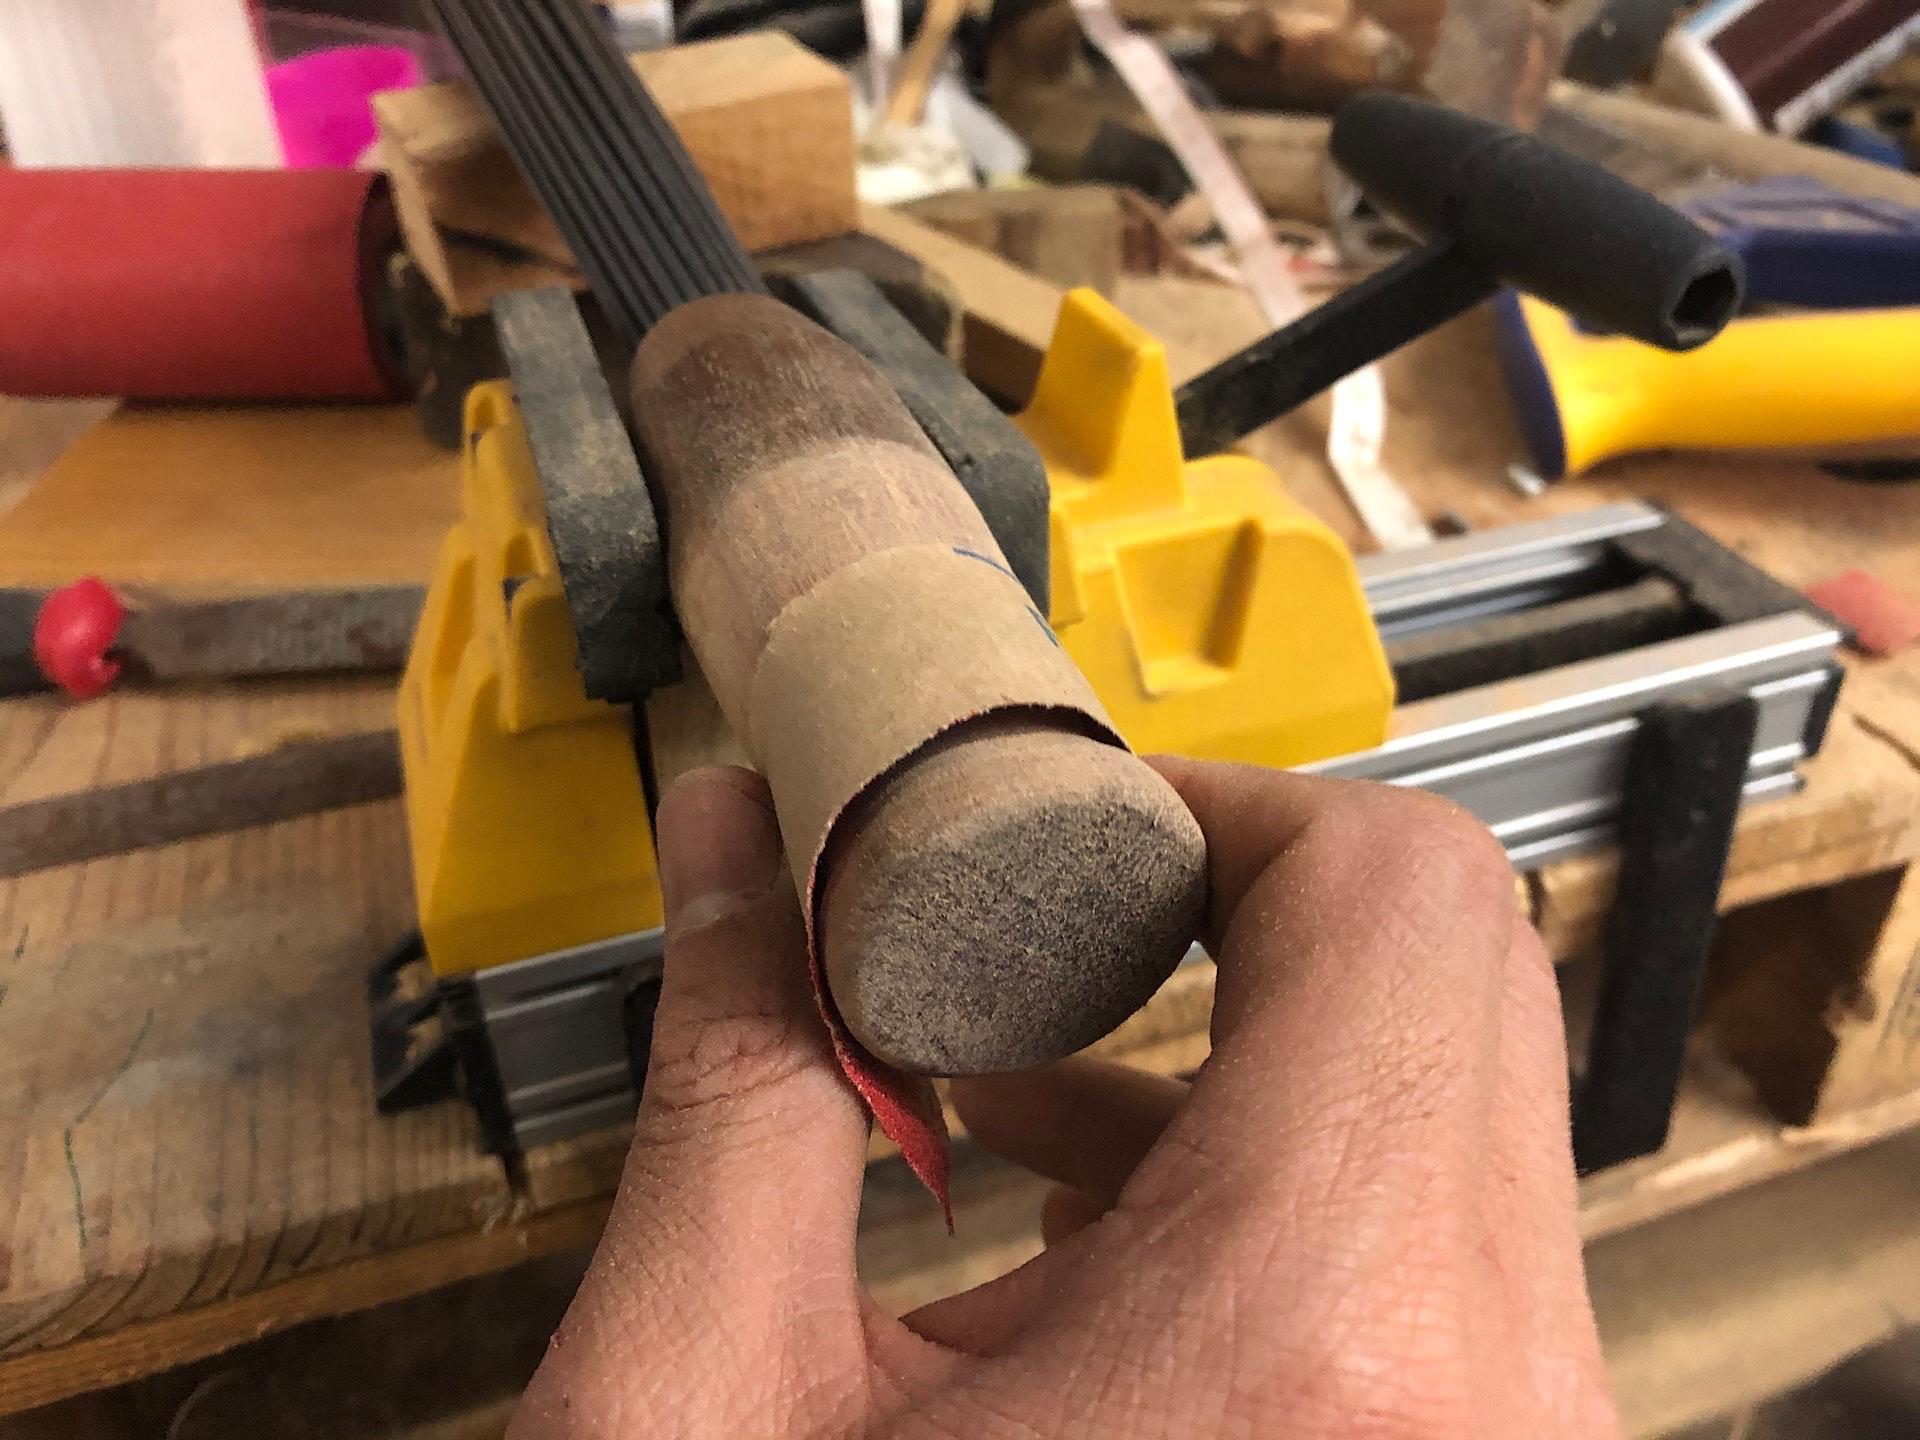 Sanding the handle